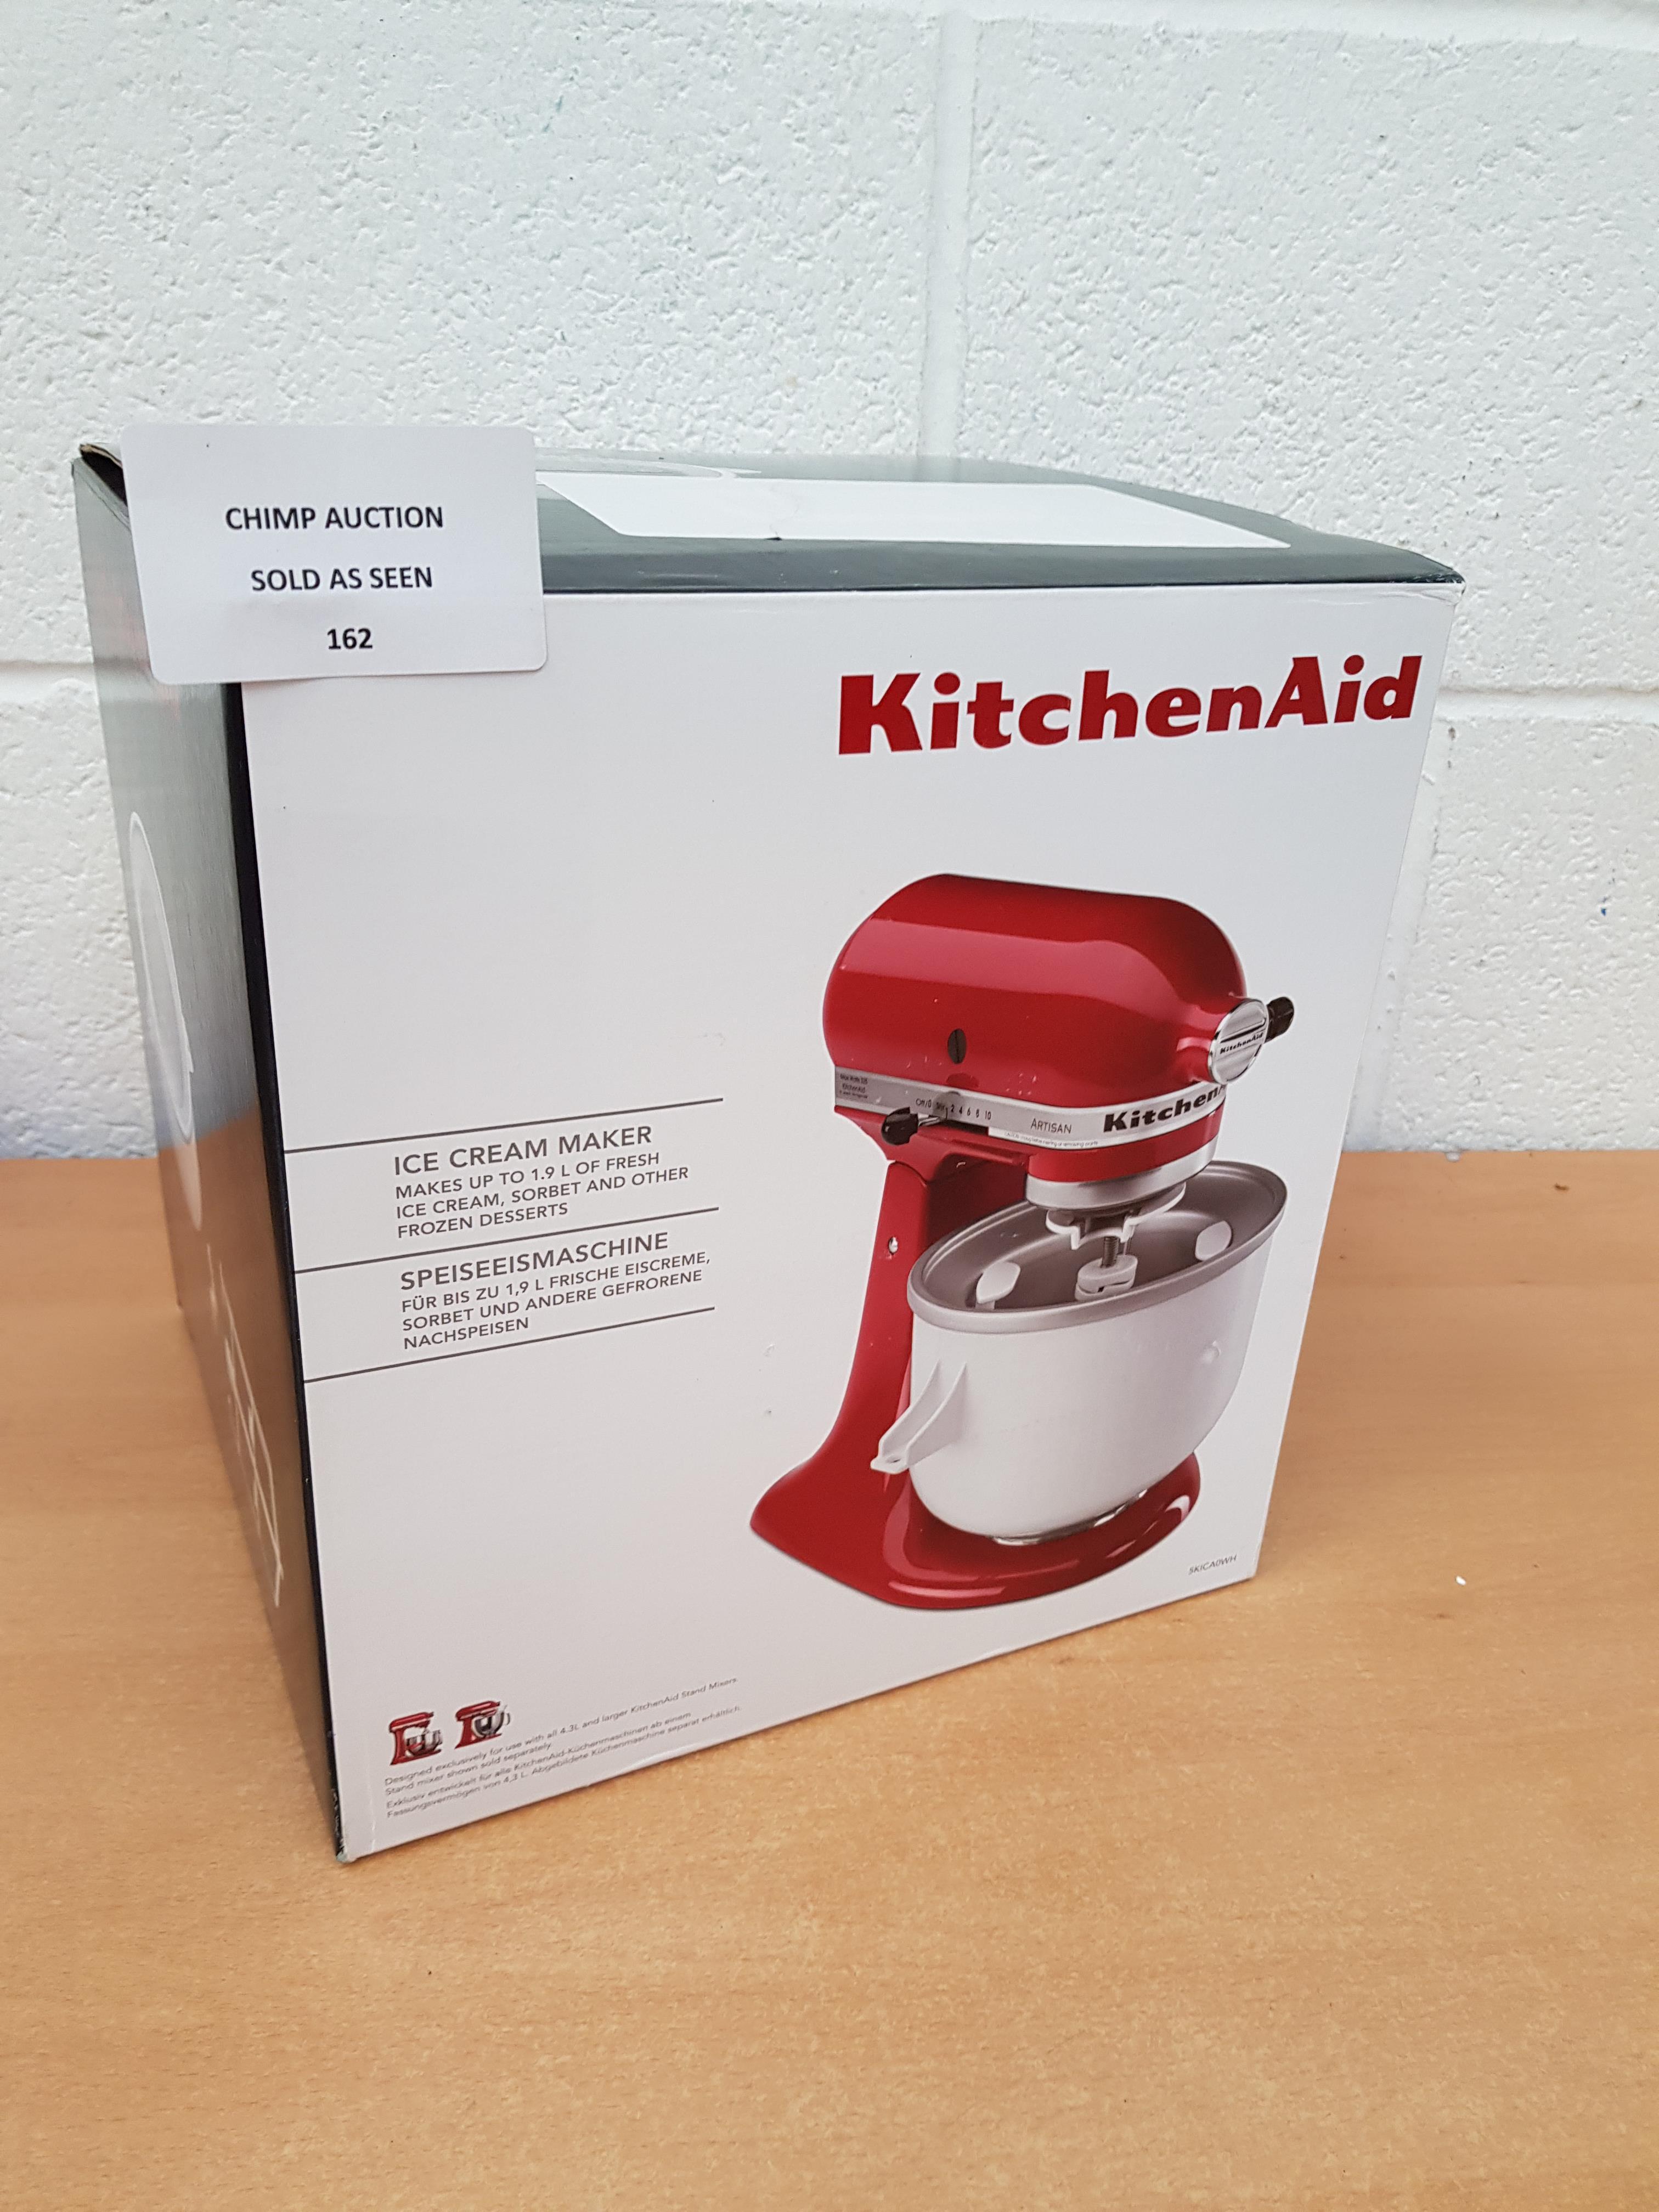 Lot 162 - KitchenAid 5KICA0WH Ice Cream Maker RRP £109.99